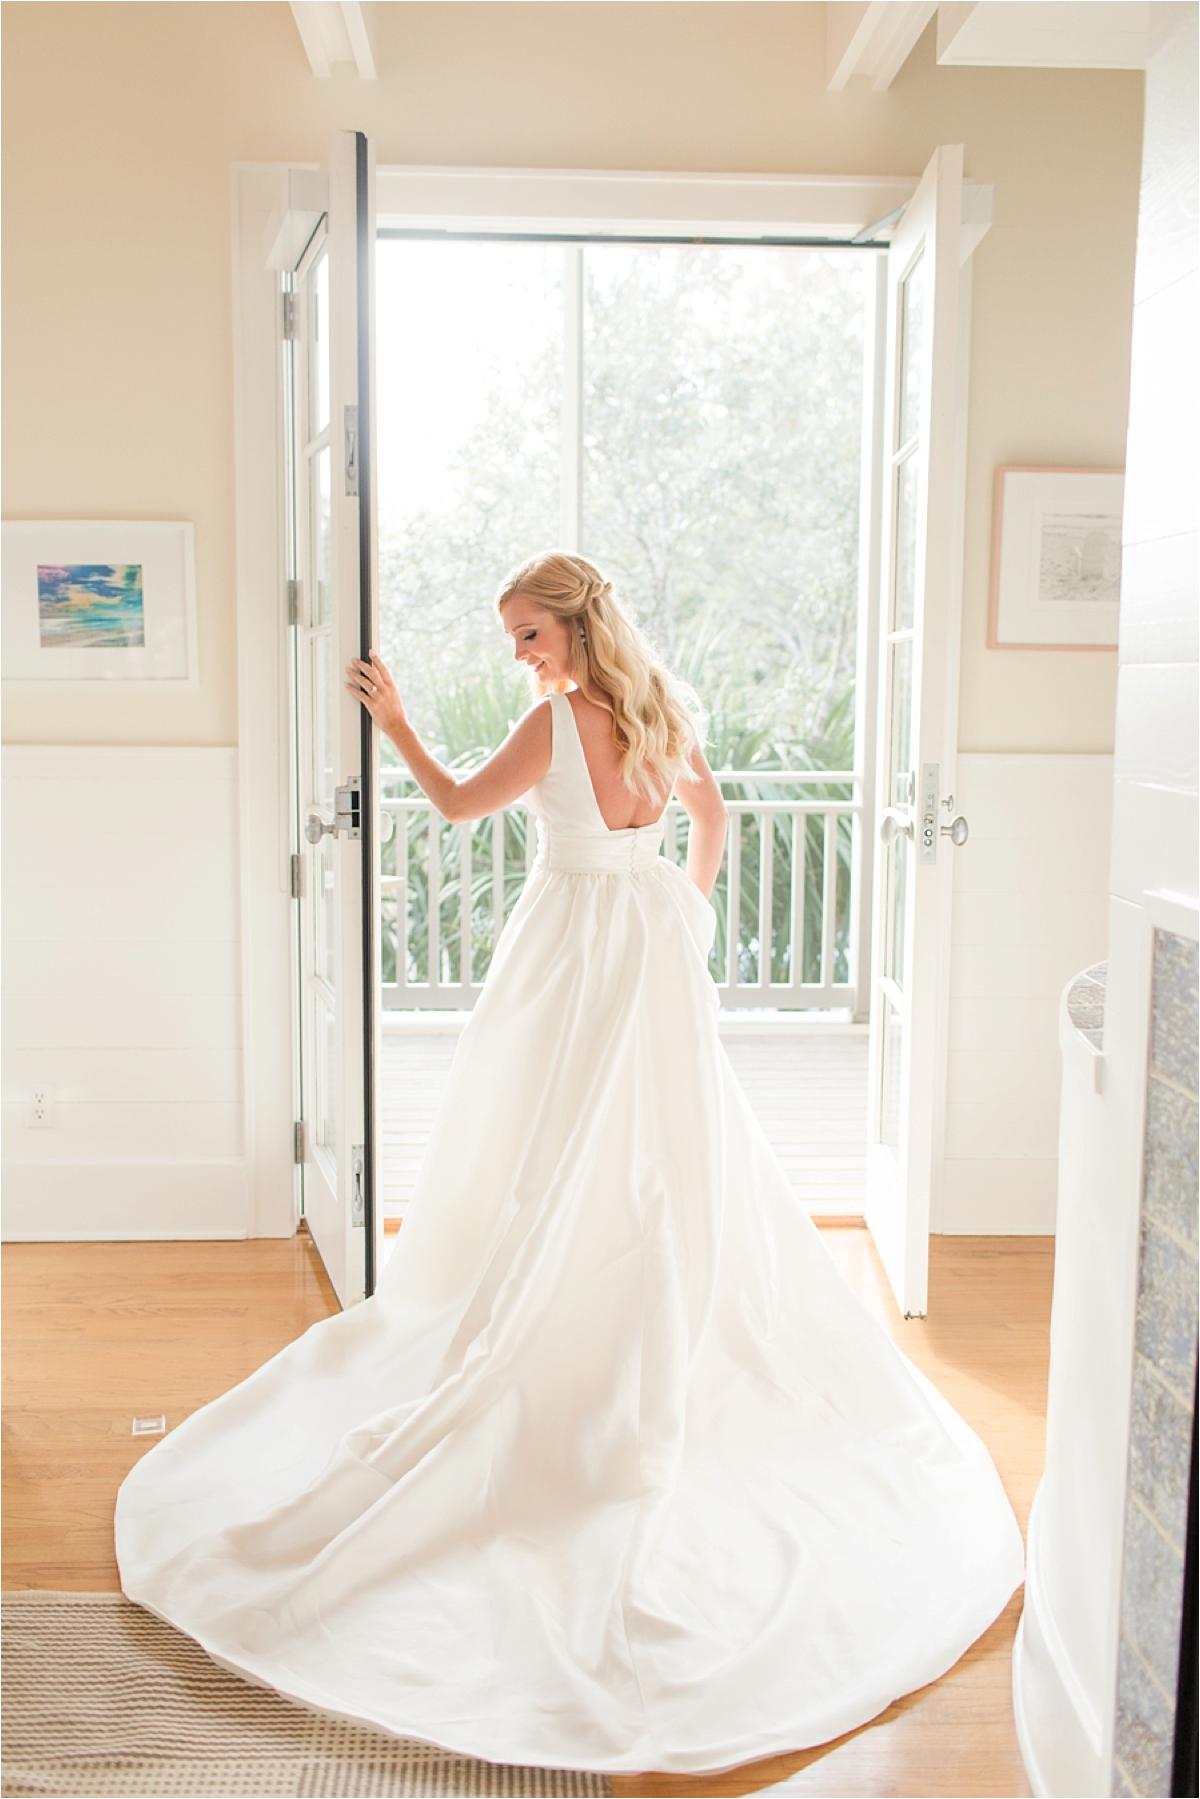 Seaside Florida Bridal Portrait Photographer-Catherine Carter-Florida bride-Beach Bridal Shoot-Alabama photographer-Sunset bridal shoot-Wedding dress